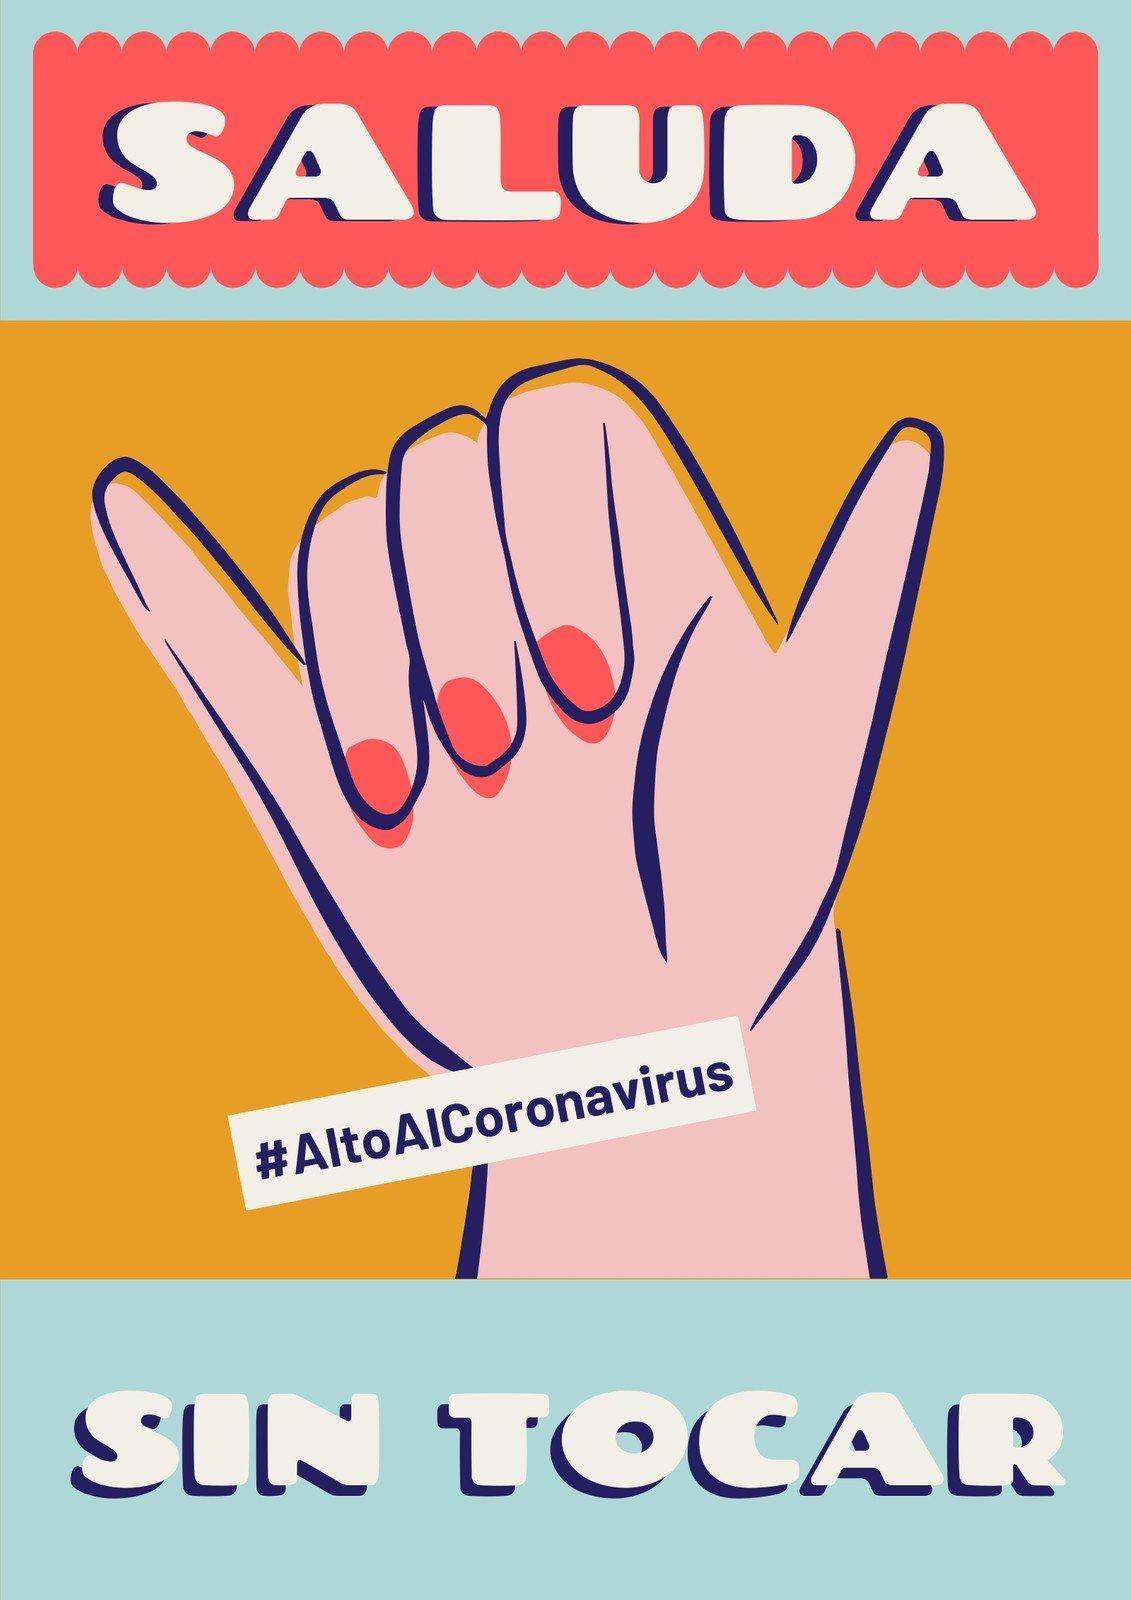 Alto Al Coronavirus Saluda sin Tocar Colorido Póster